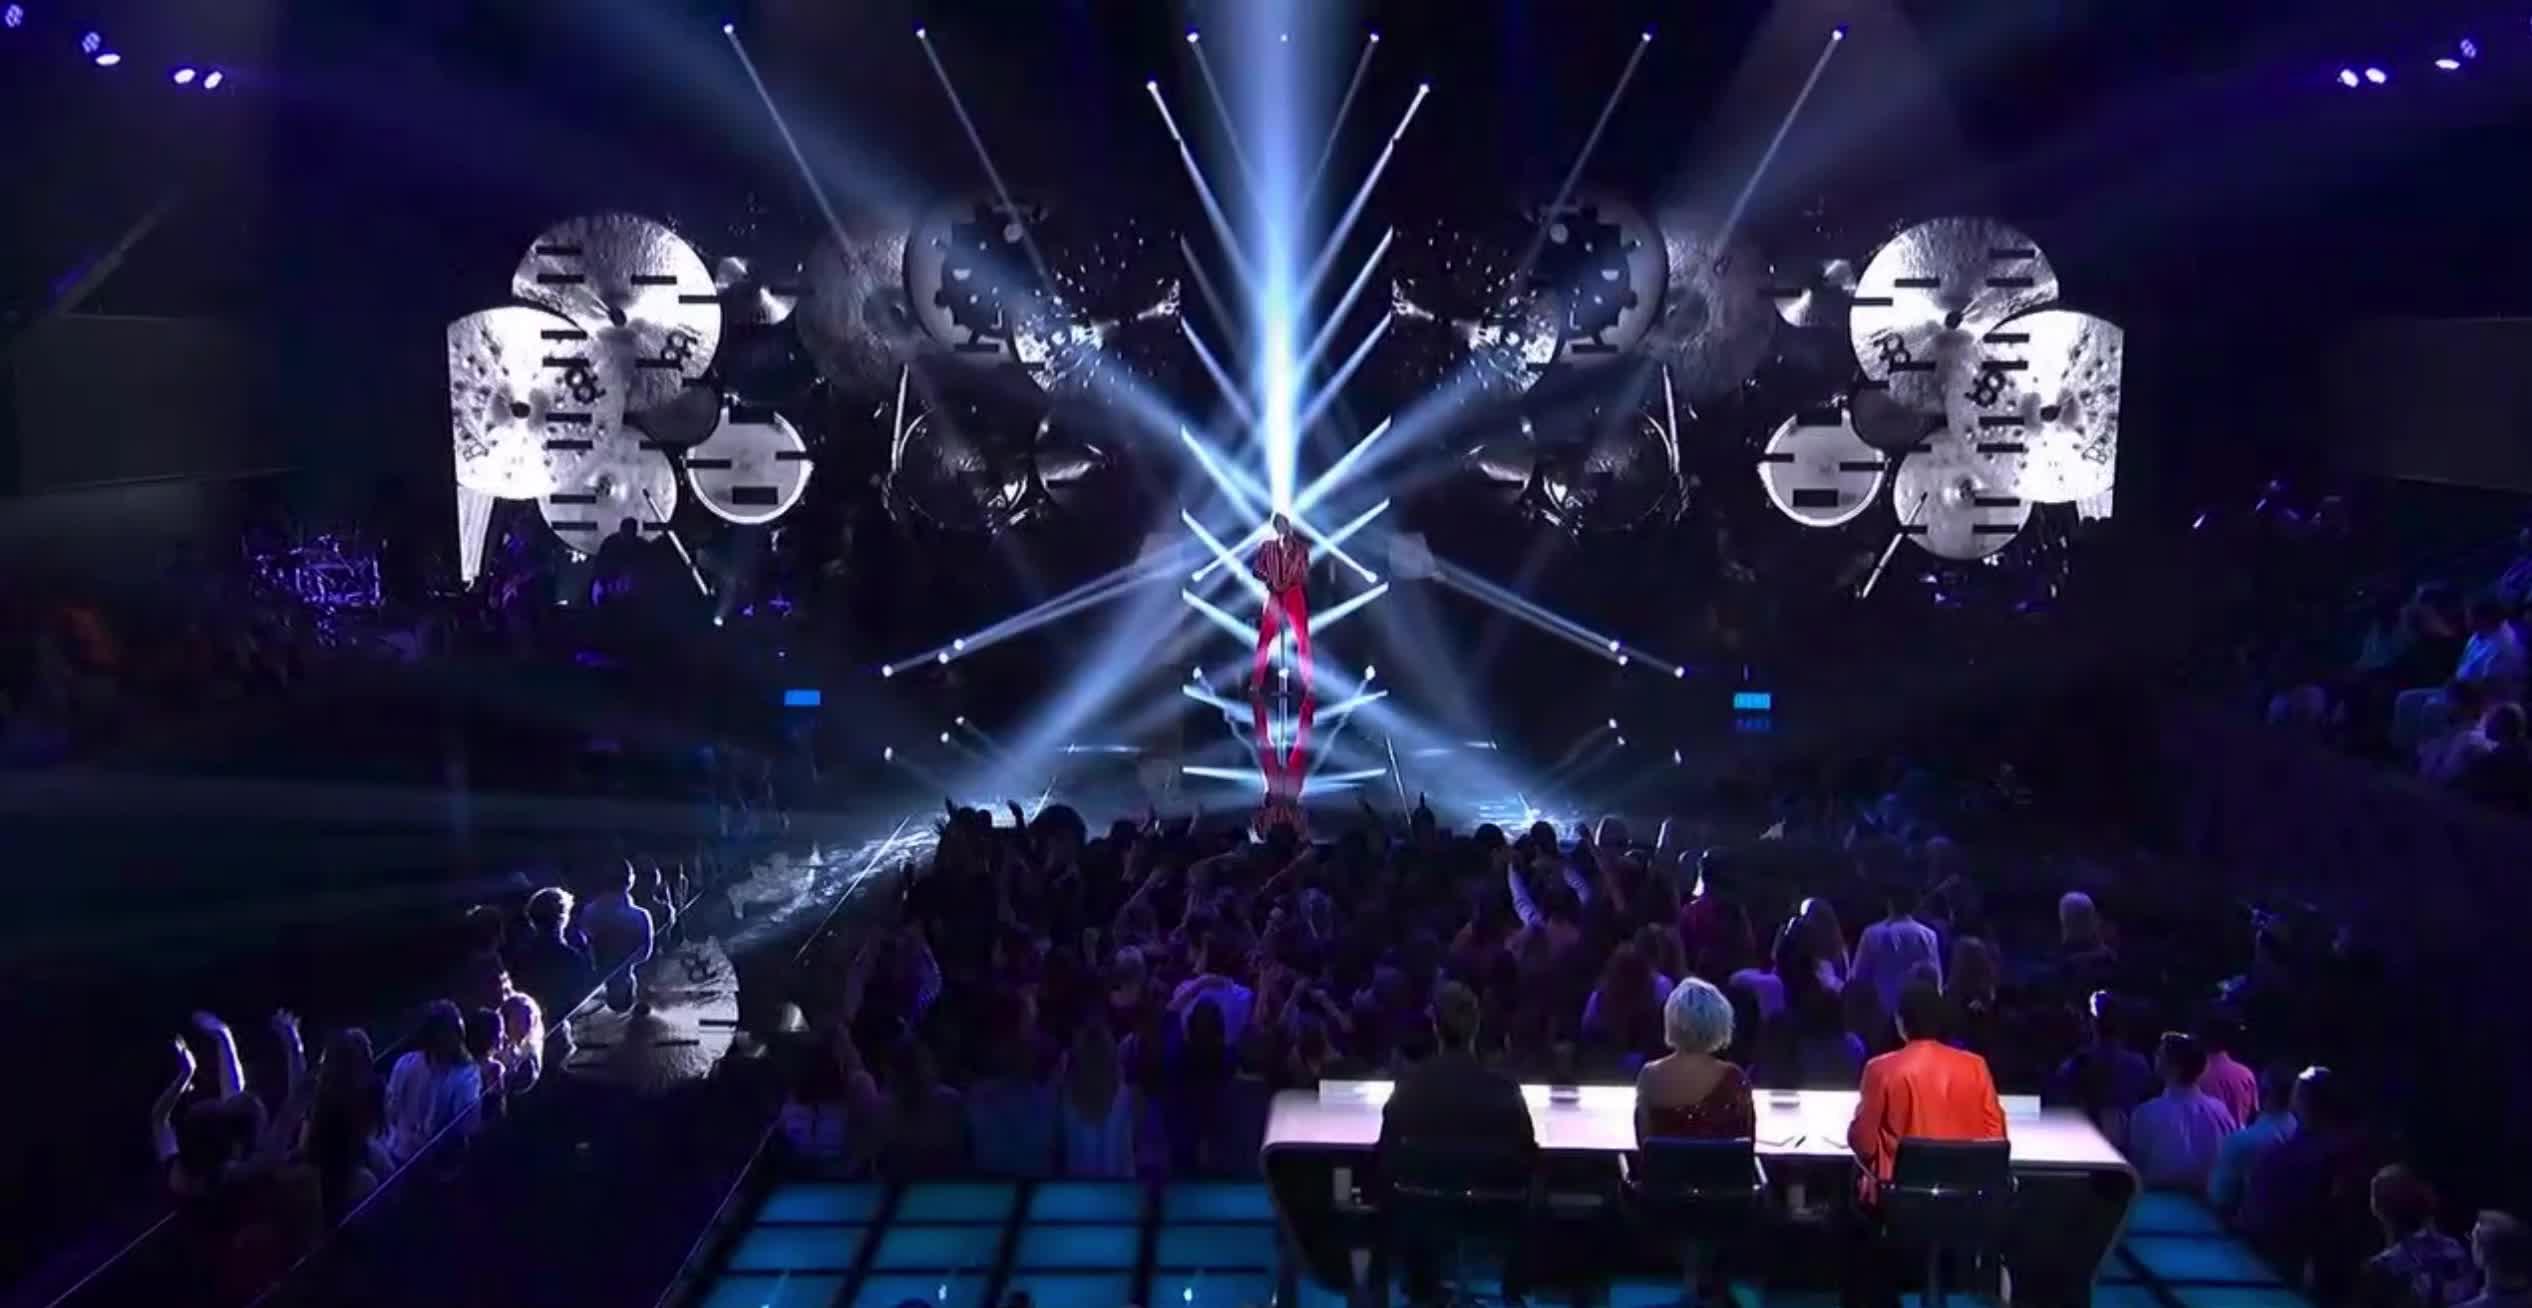 american idol, american idol season 17, americanidol, katy perry, lionel richie, luke bryan, ryan seacrest, season 17, singing, uche, American Idol Uche's Performance GIFs